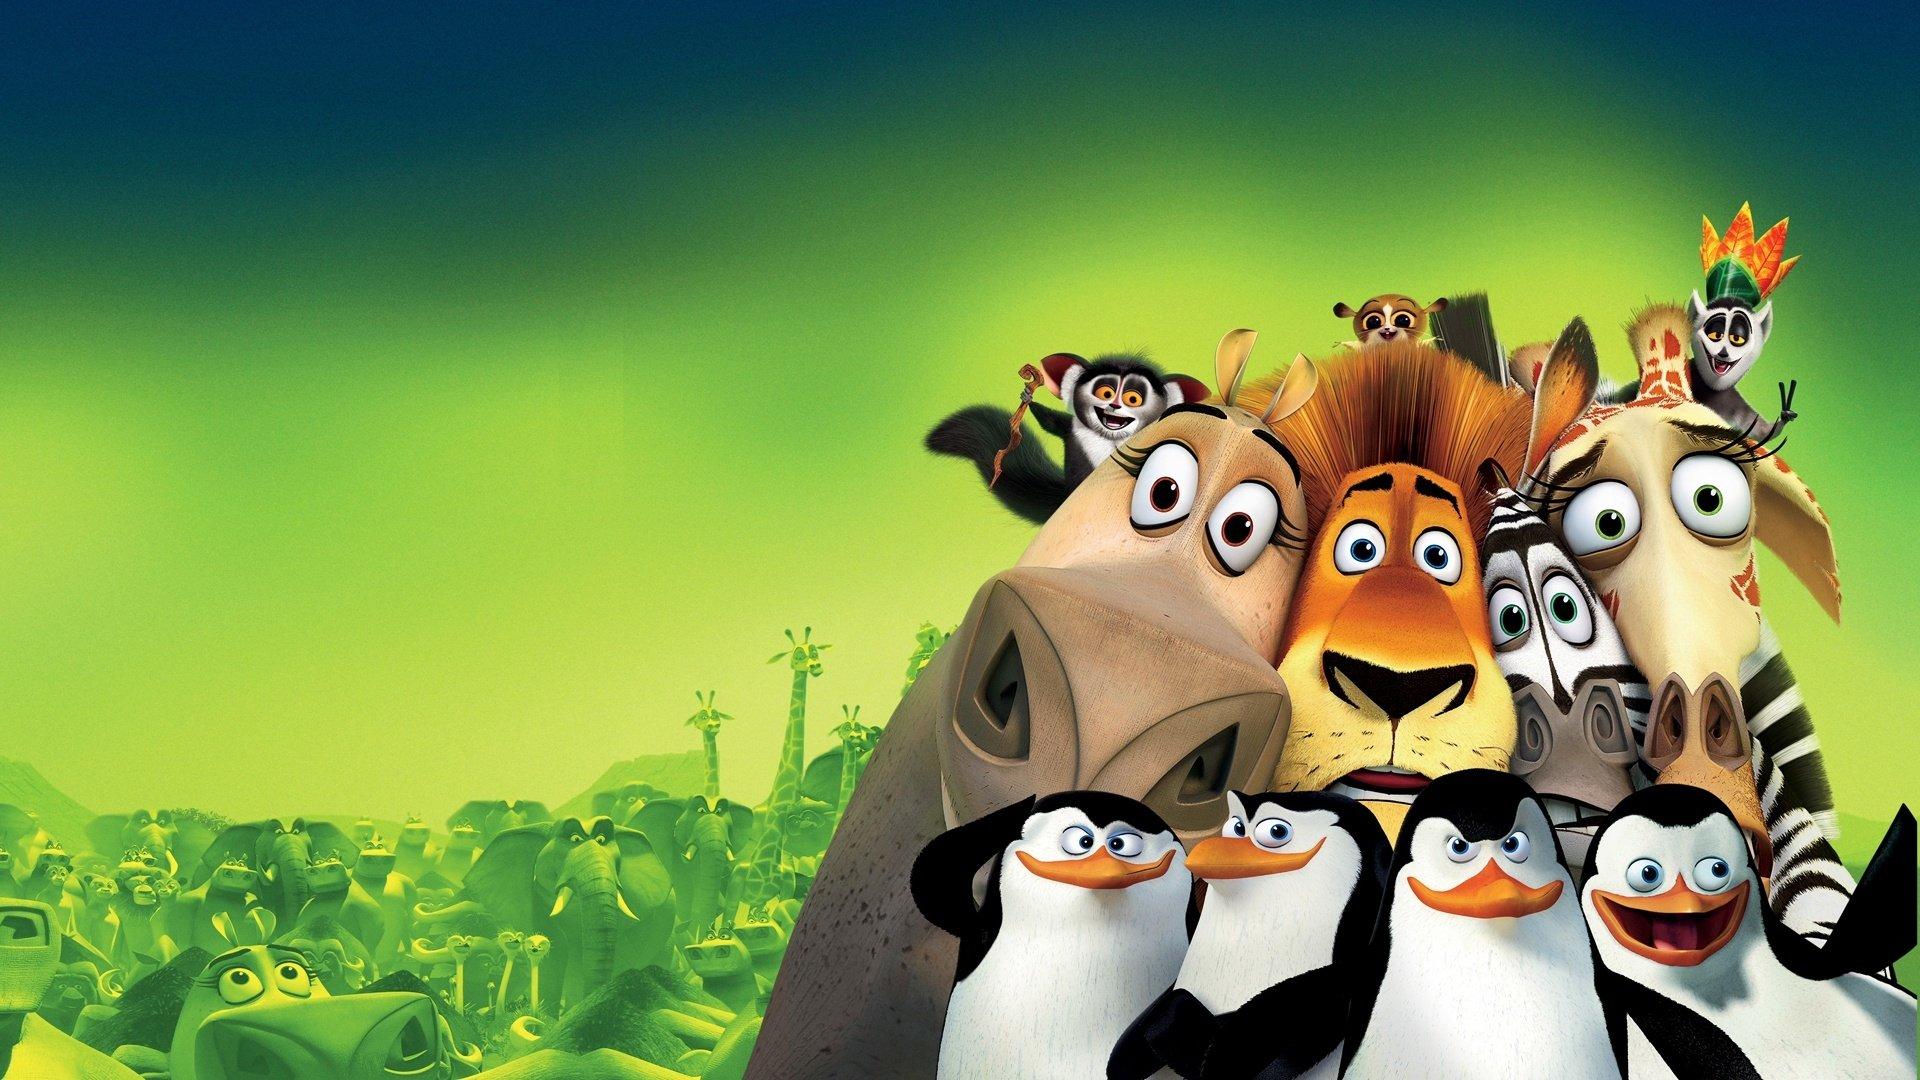 Imagens Full Hd 1080p 3d: Madagascar Full HD Fondo De Pantalla And Fondo De